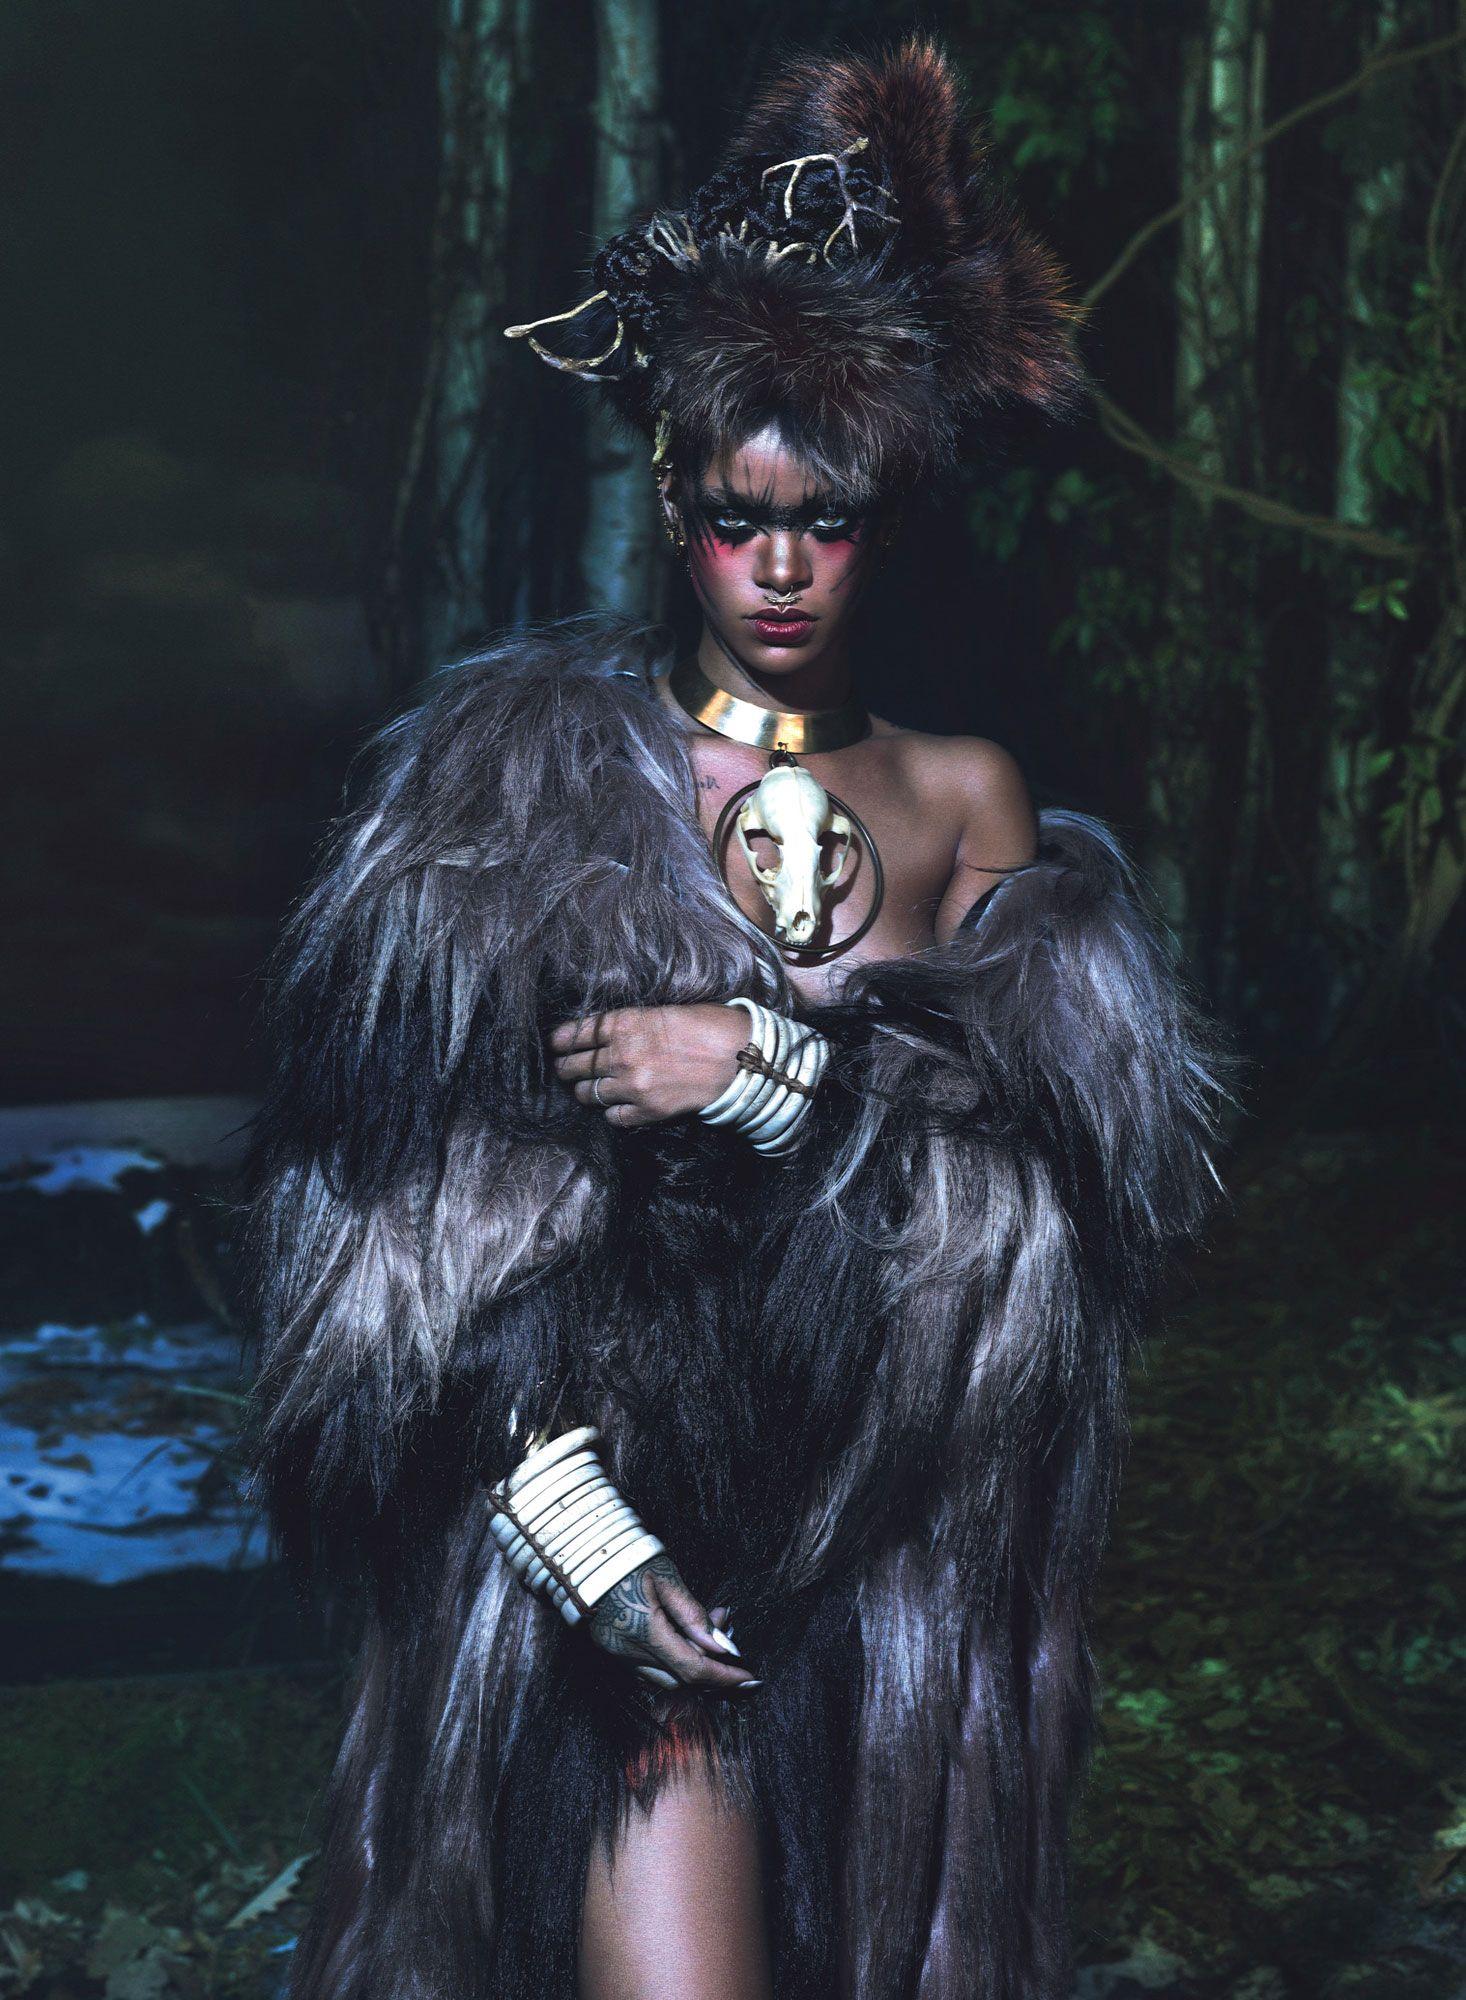 W Magazine Setembro 2014 | Rihanna por Mert Alas & Marcus Piggott [Capa]